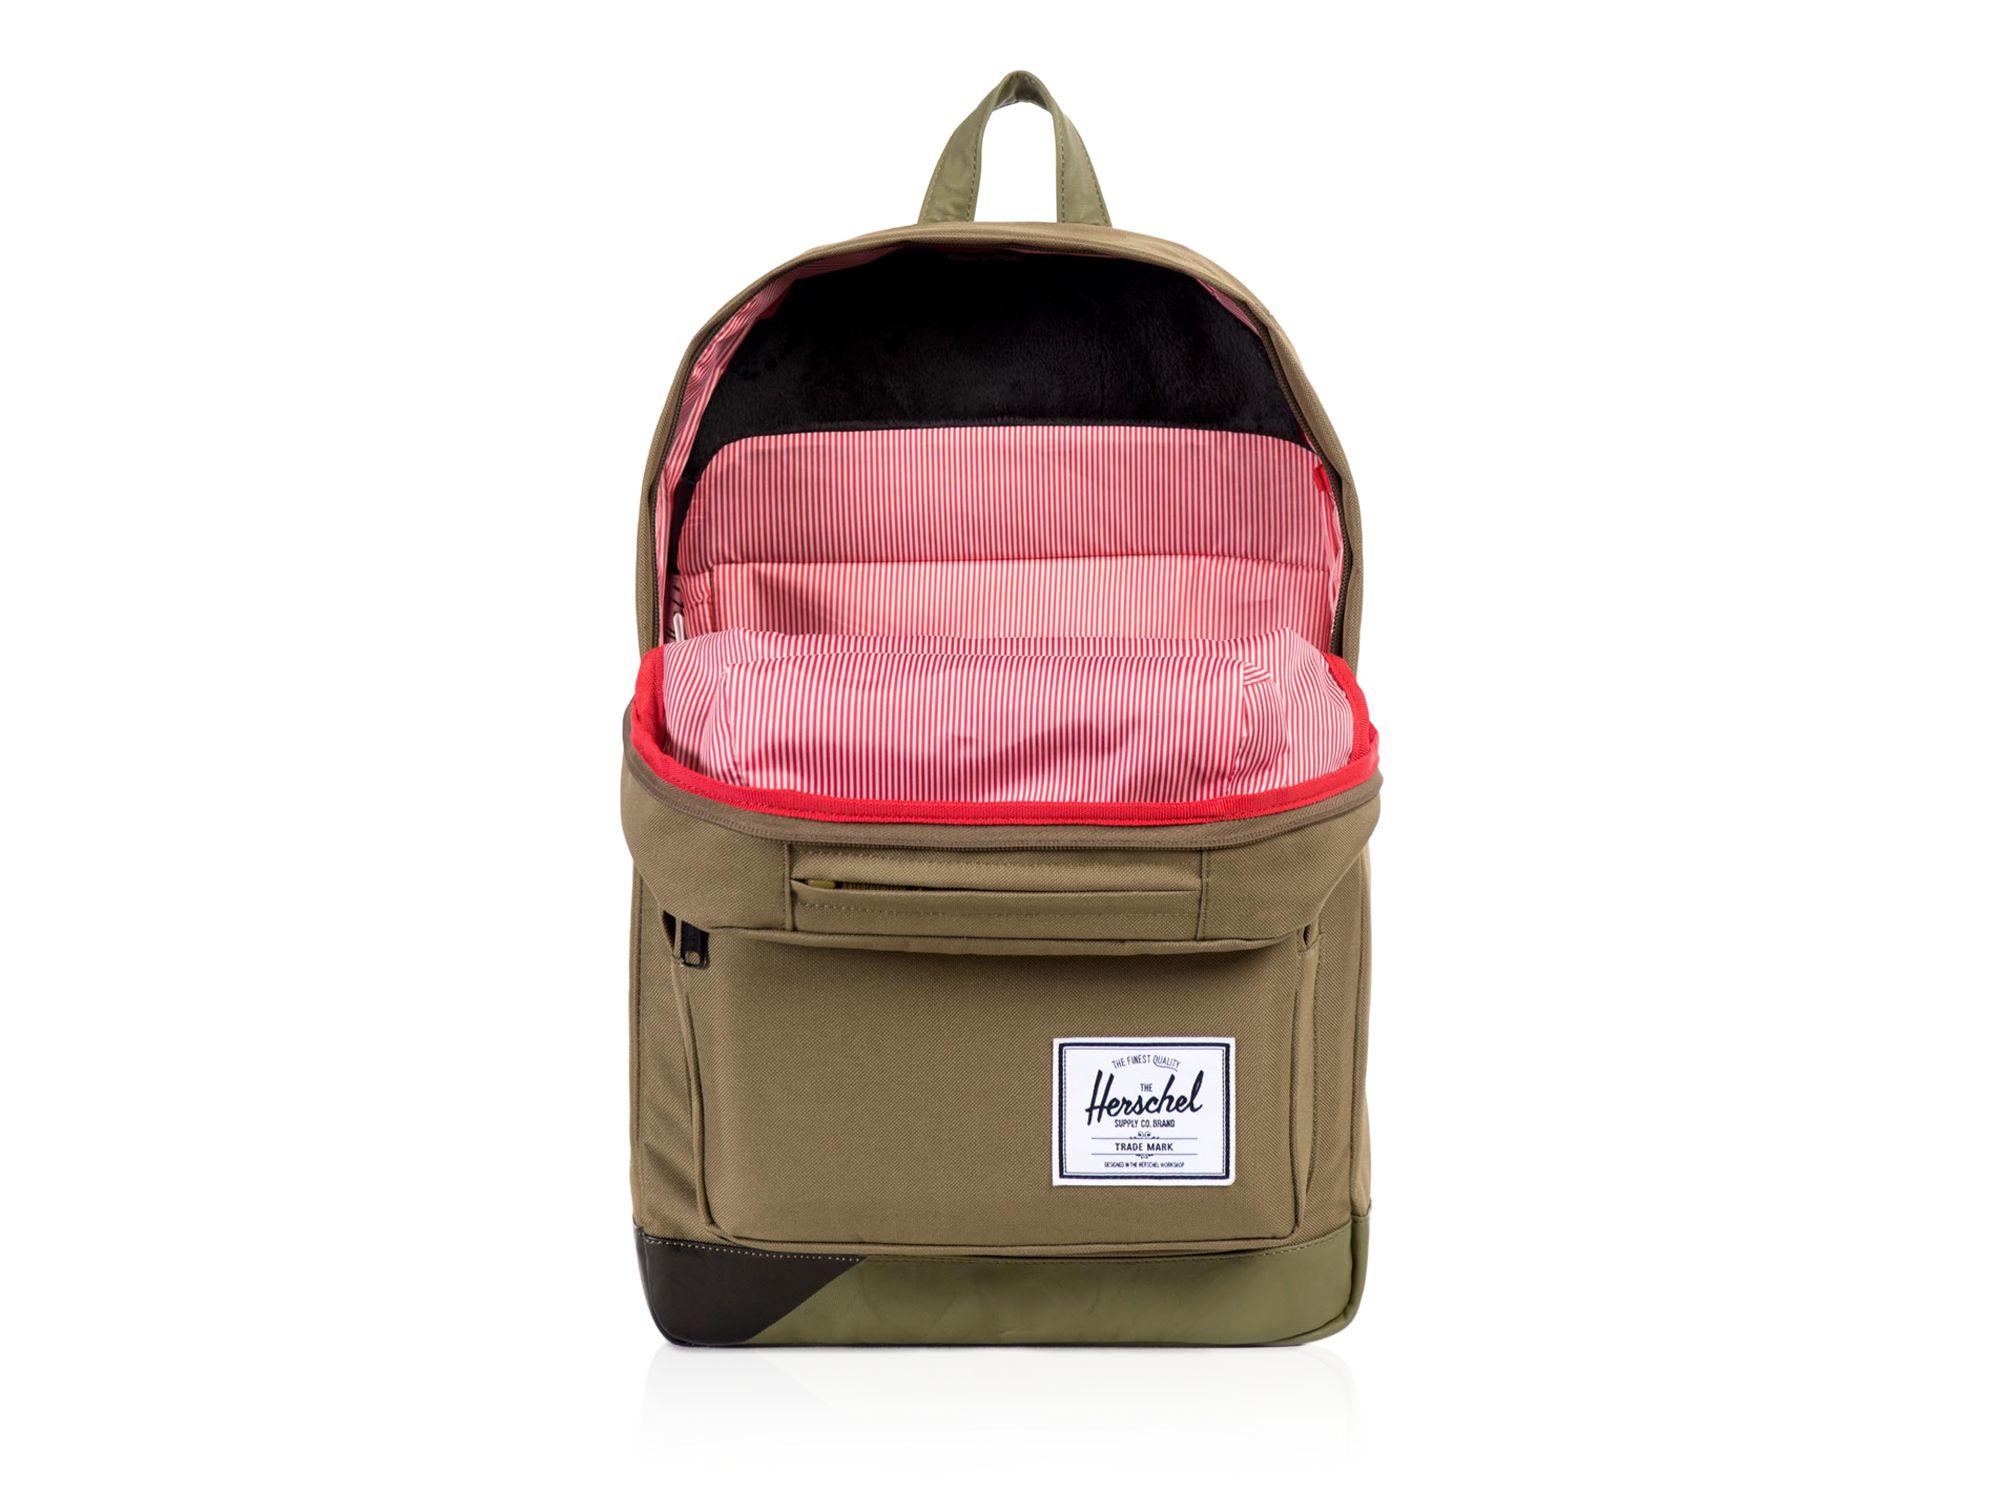 Lyst - Herschel Supply Co. Pop Quiz Backpack in Green for Men 31d2fd067dd03